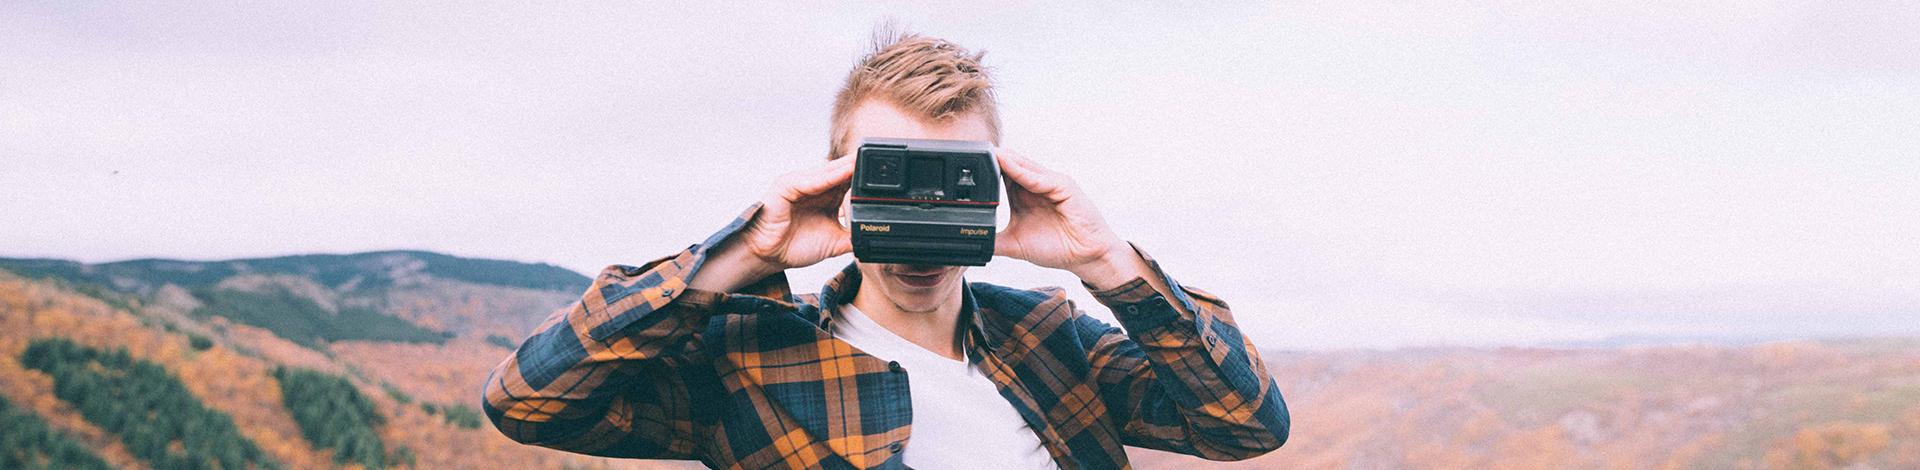 Photos - Automne